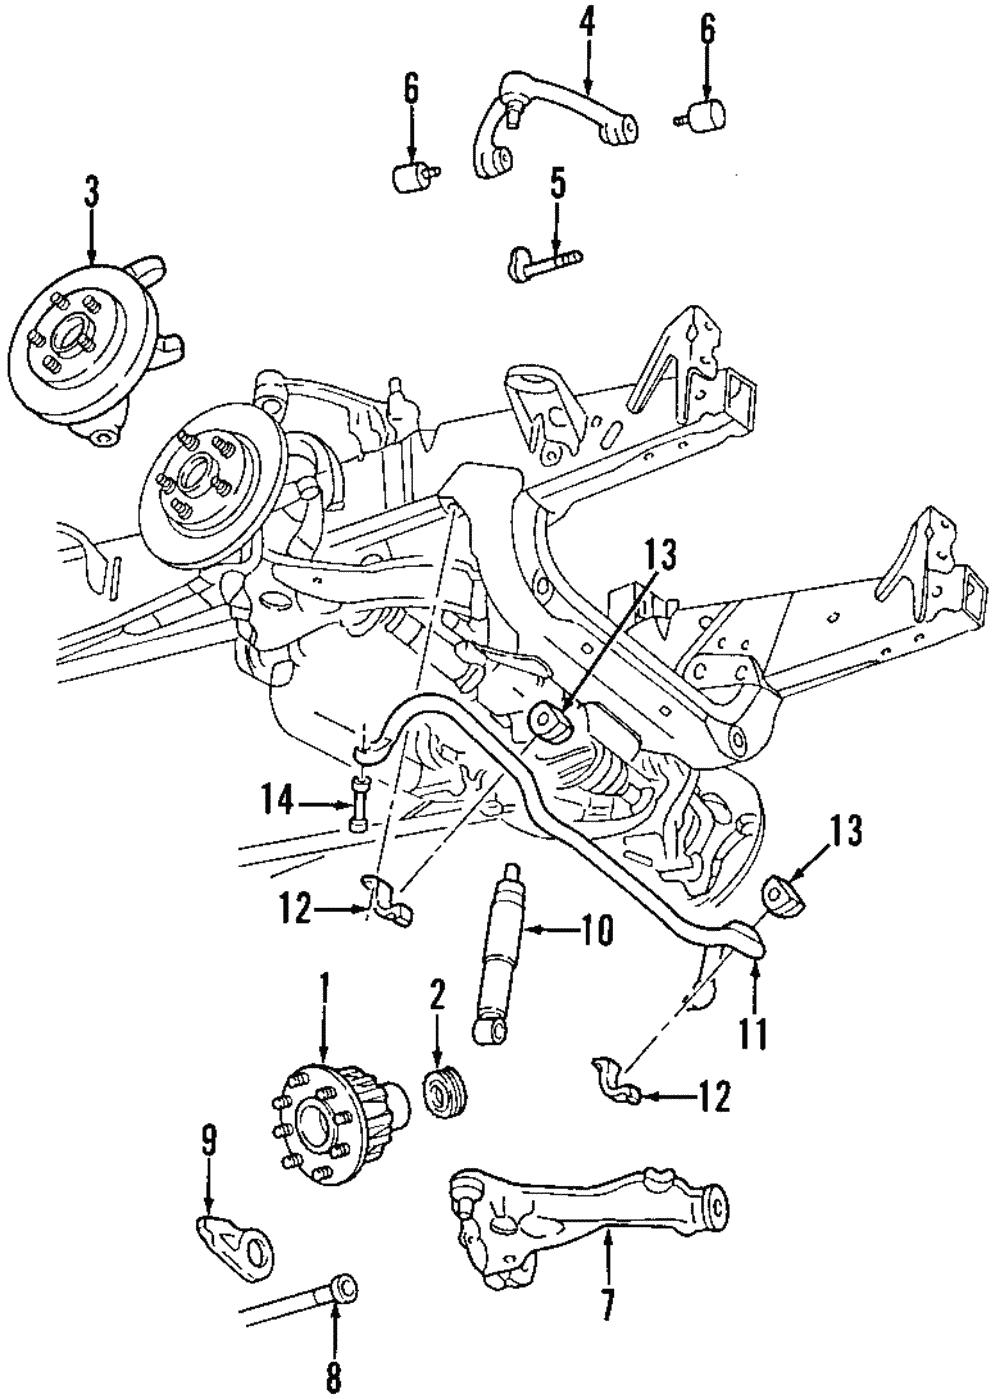 Genuine Ford Hub Assembly G2mz 1104 U Ebay Diagram